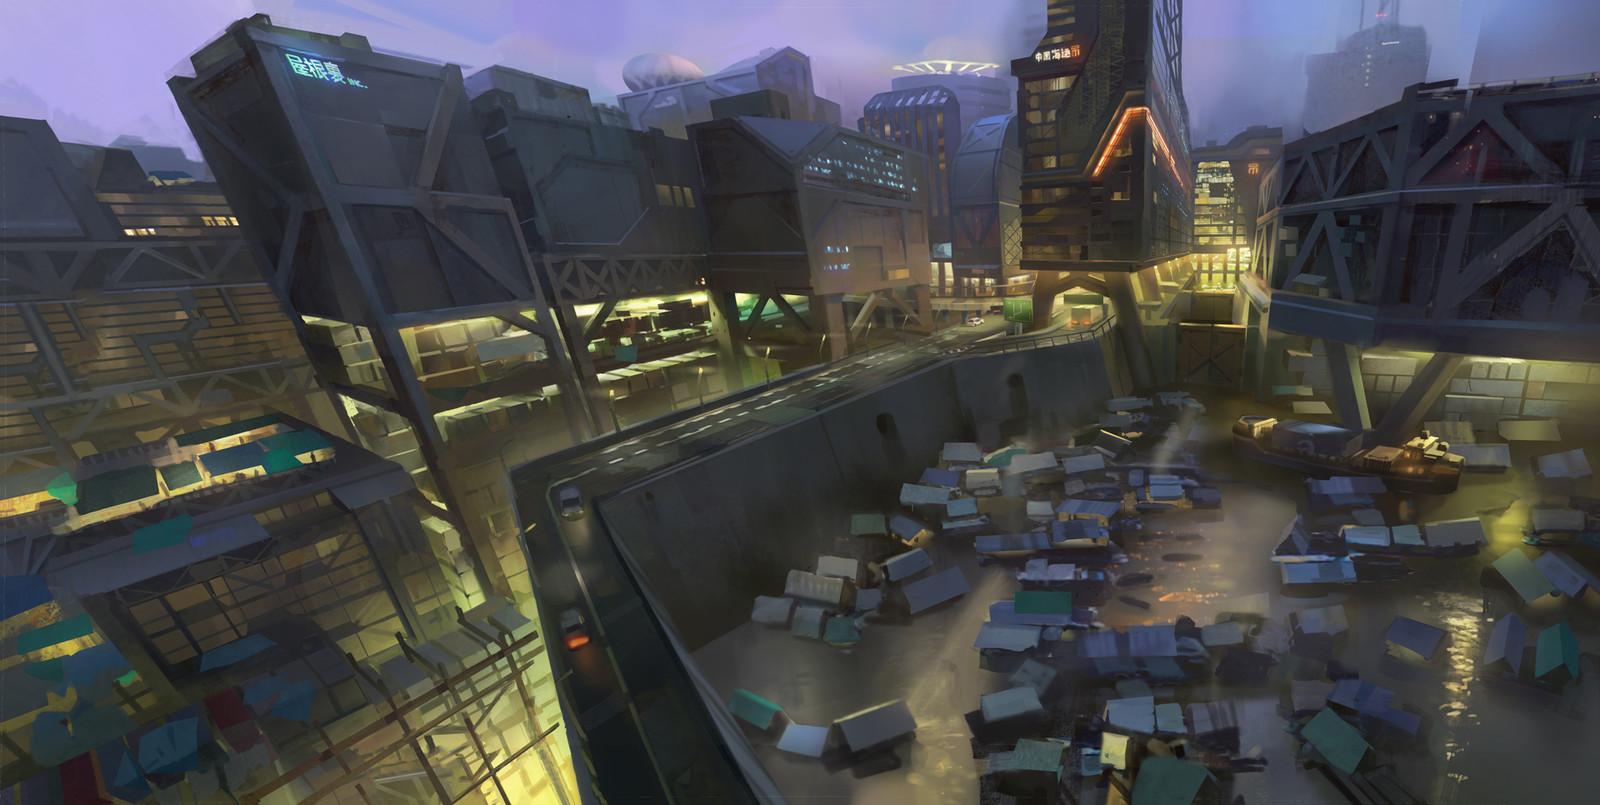 Walled City (+ process)